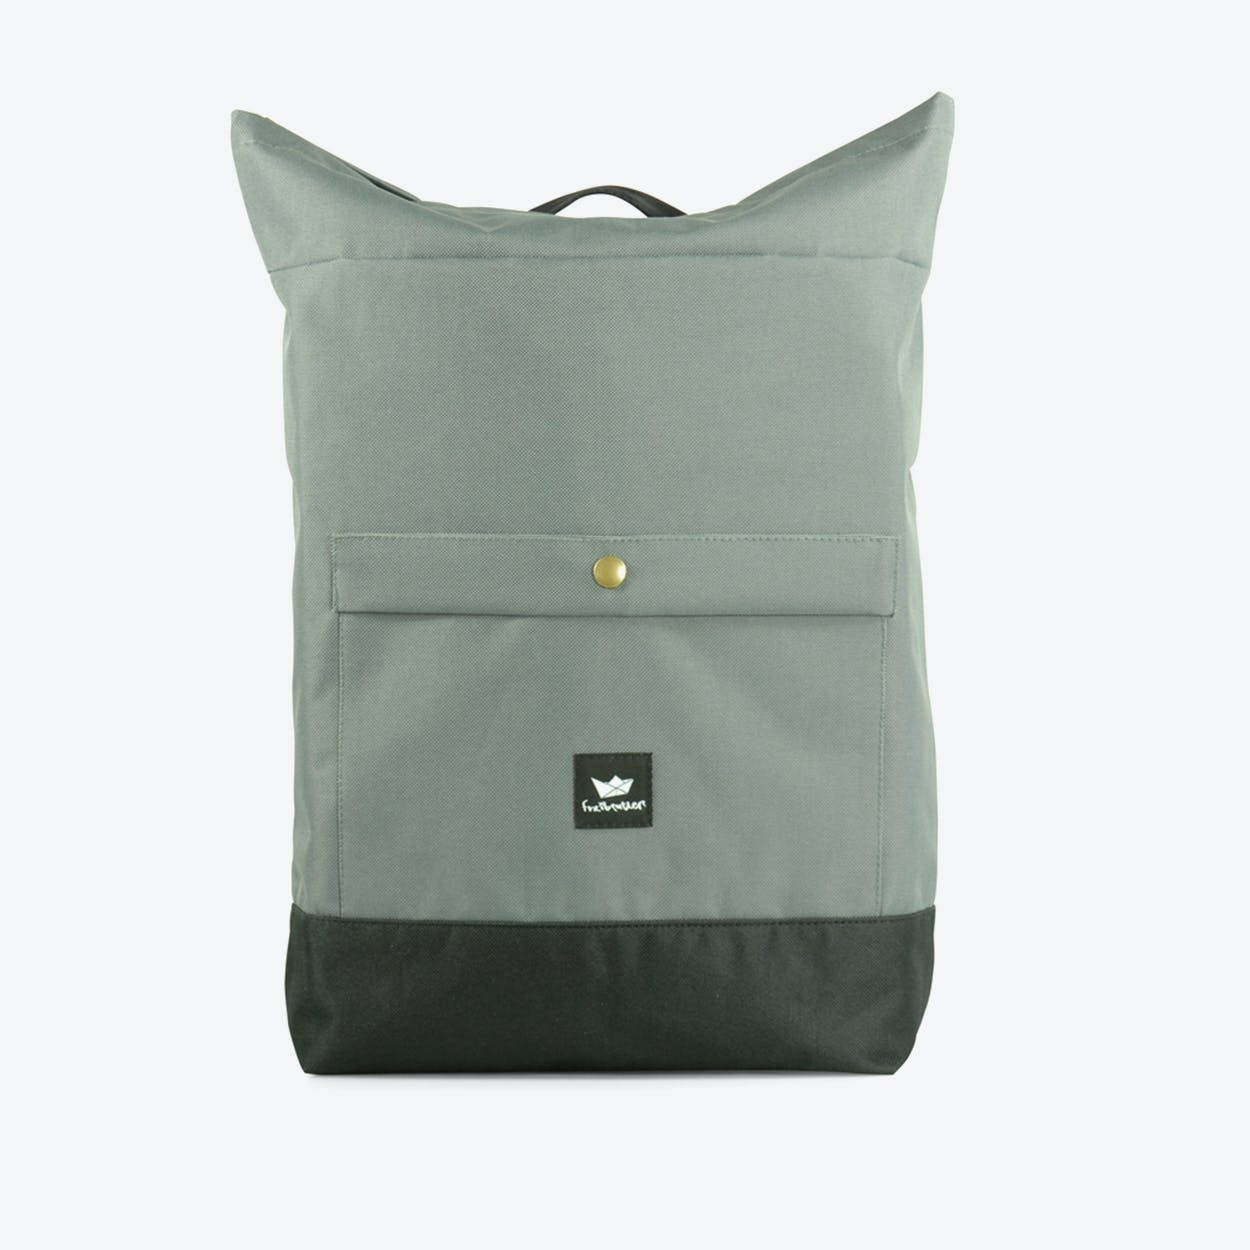 Barrio Bag - Black/Grey